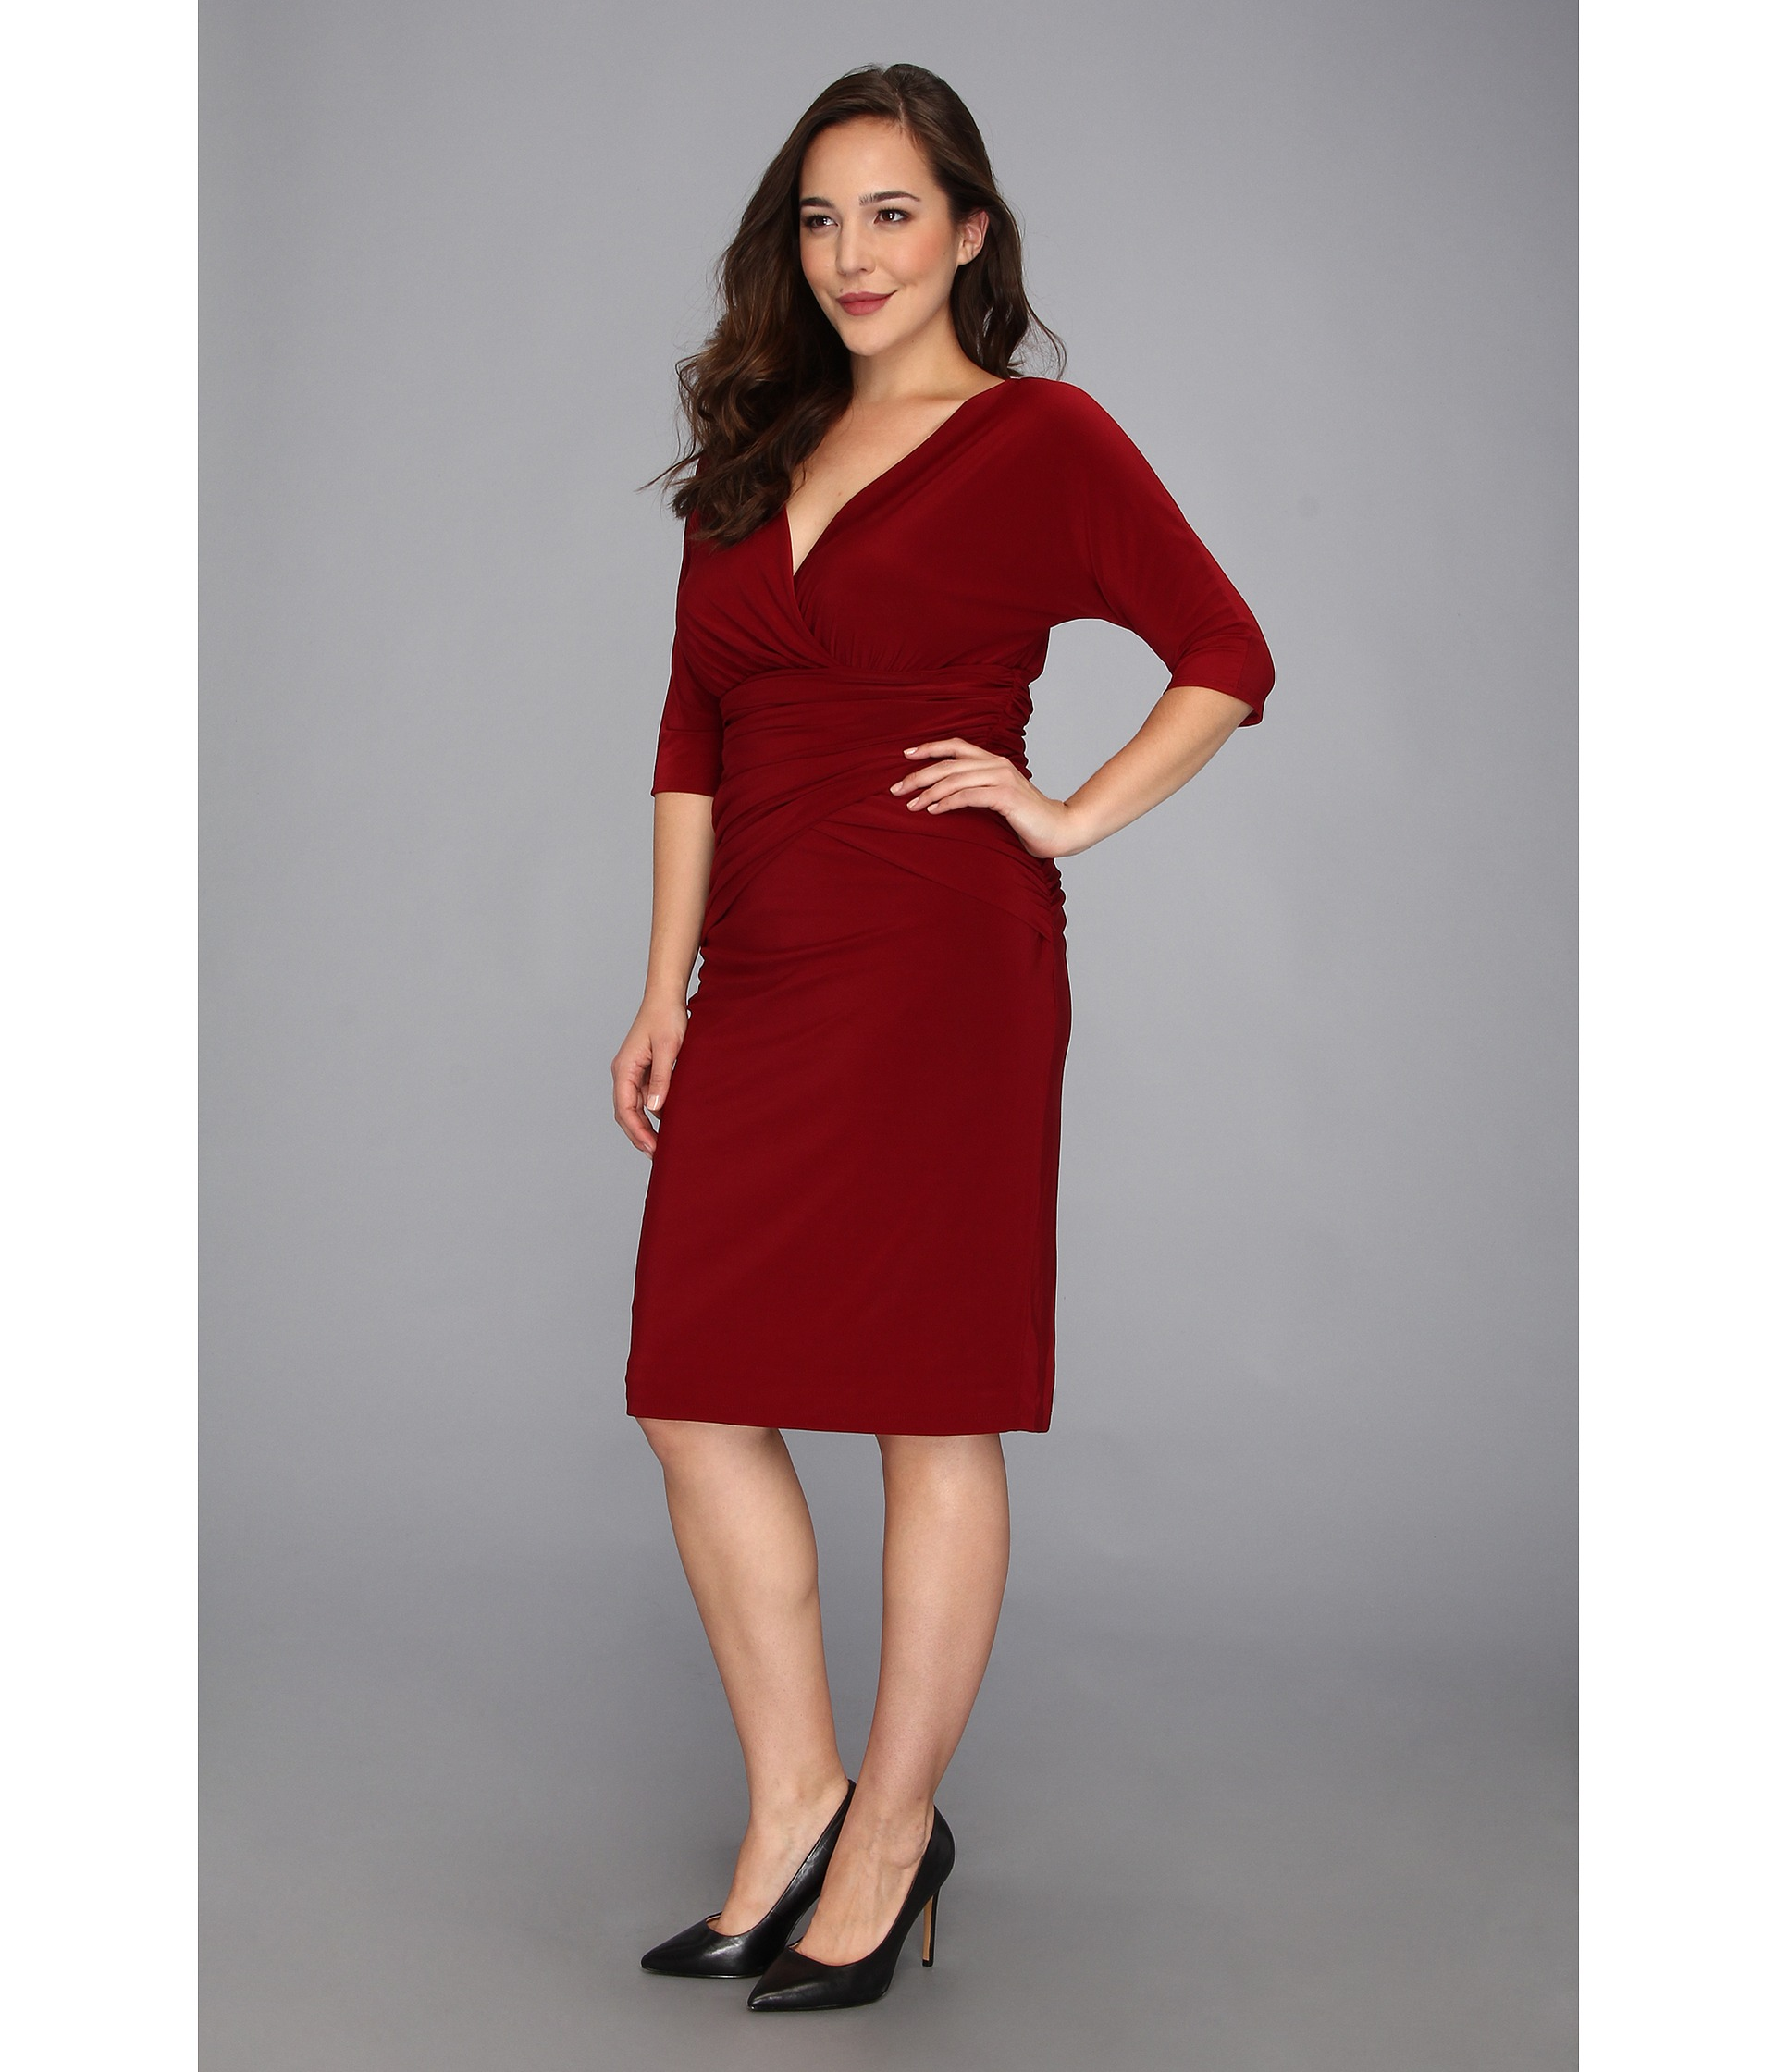 Womens Dress Shoes Victoria Bc